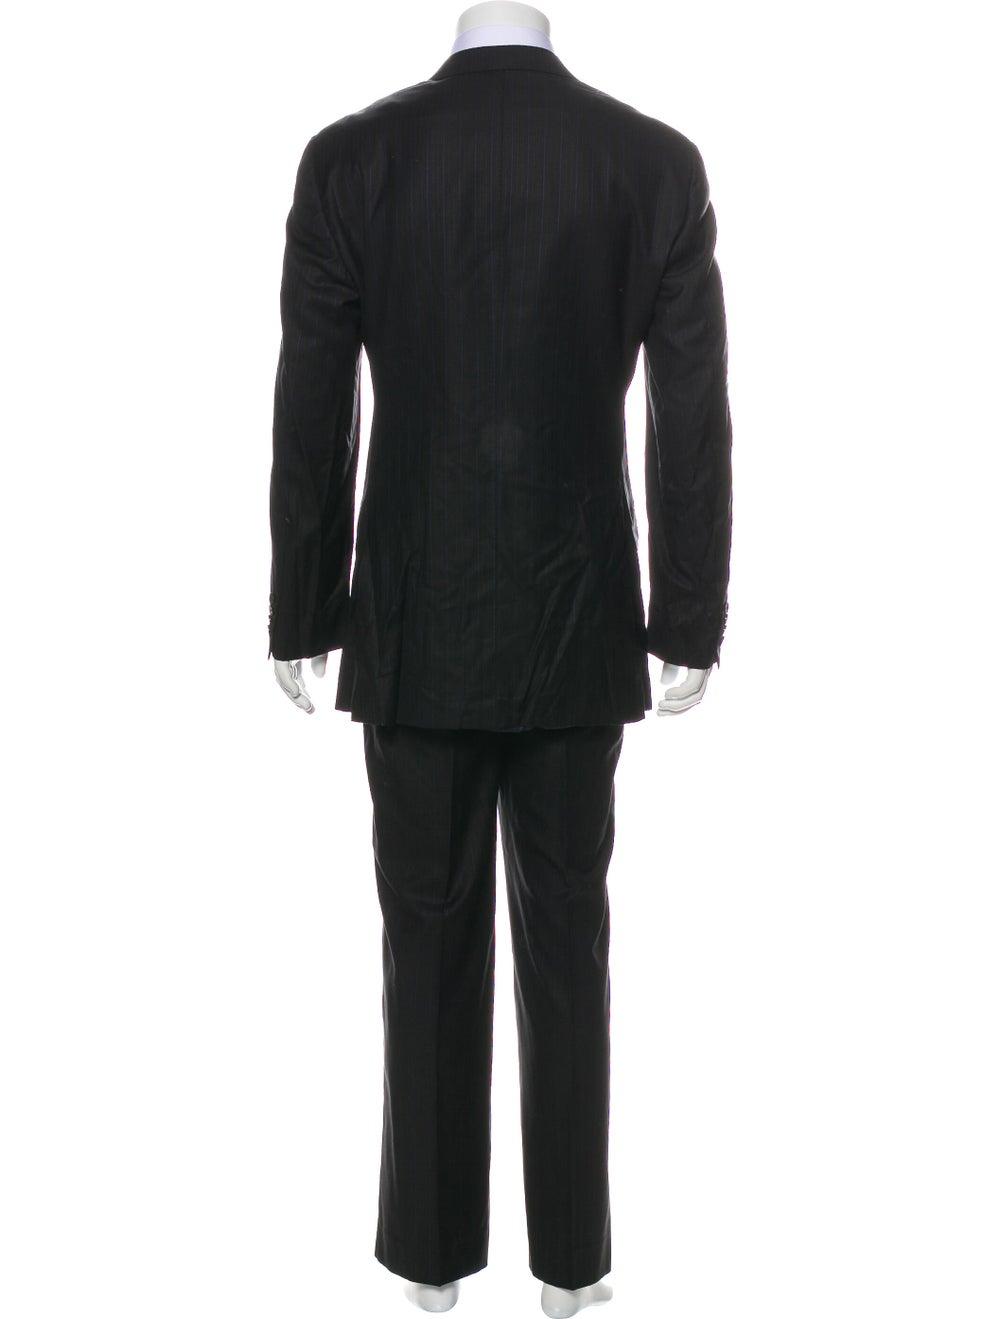 Ermenegildo Zegna Silk Striped Two-Piece Suit Bla… - image 3